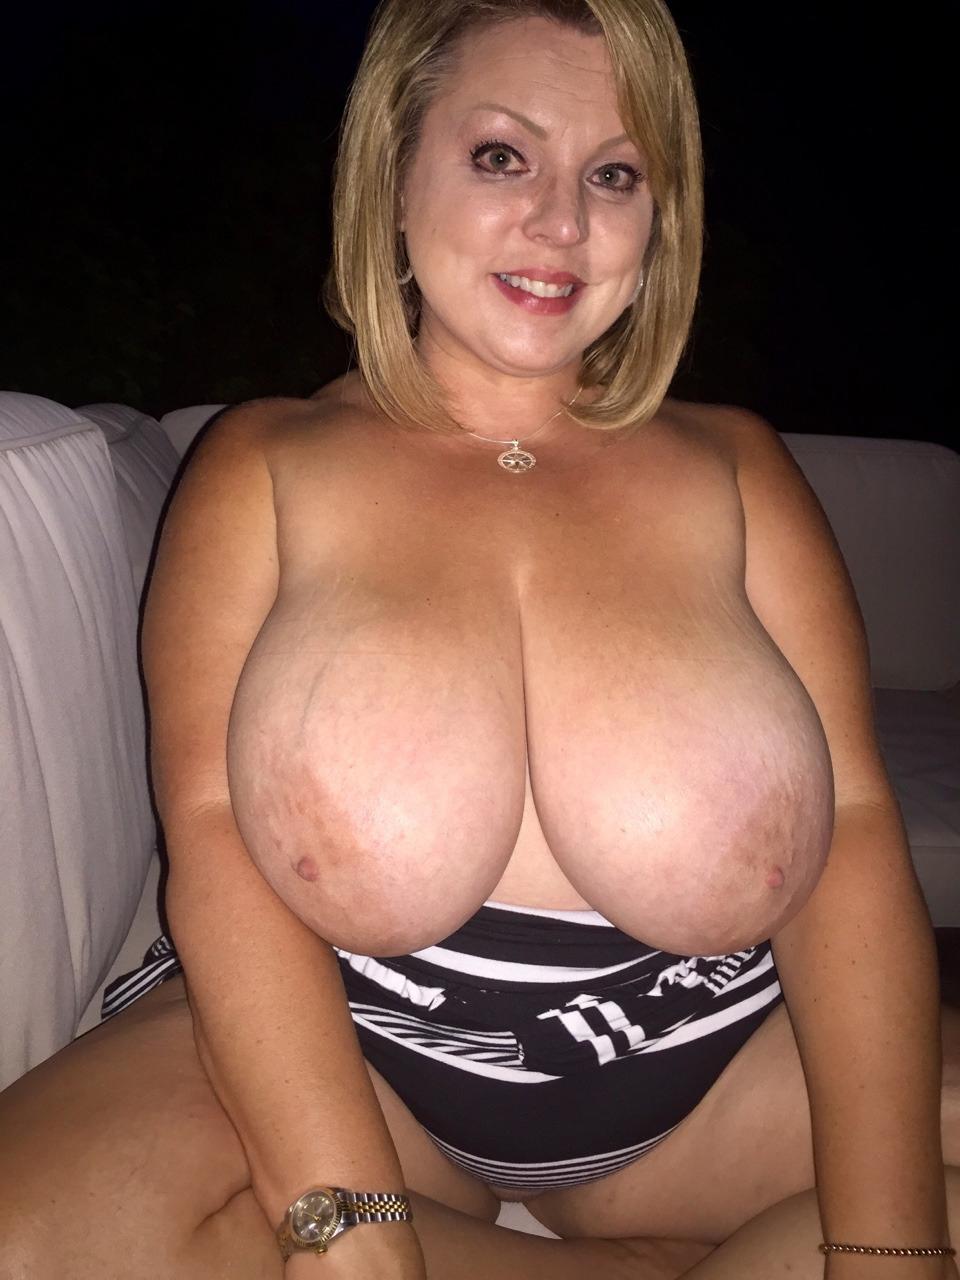 Huge breasted women porn